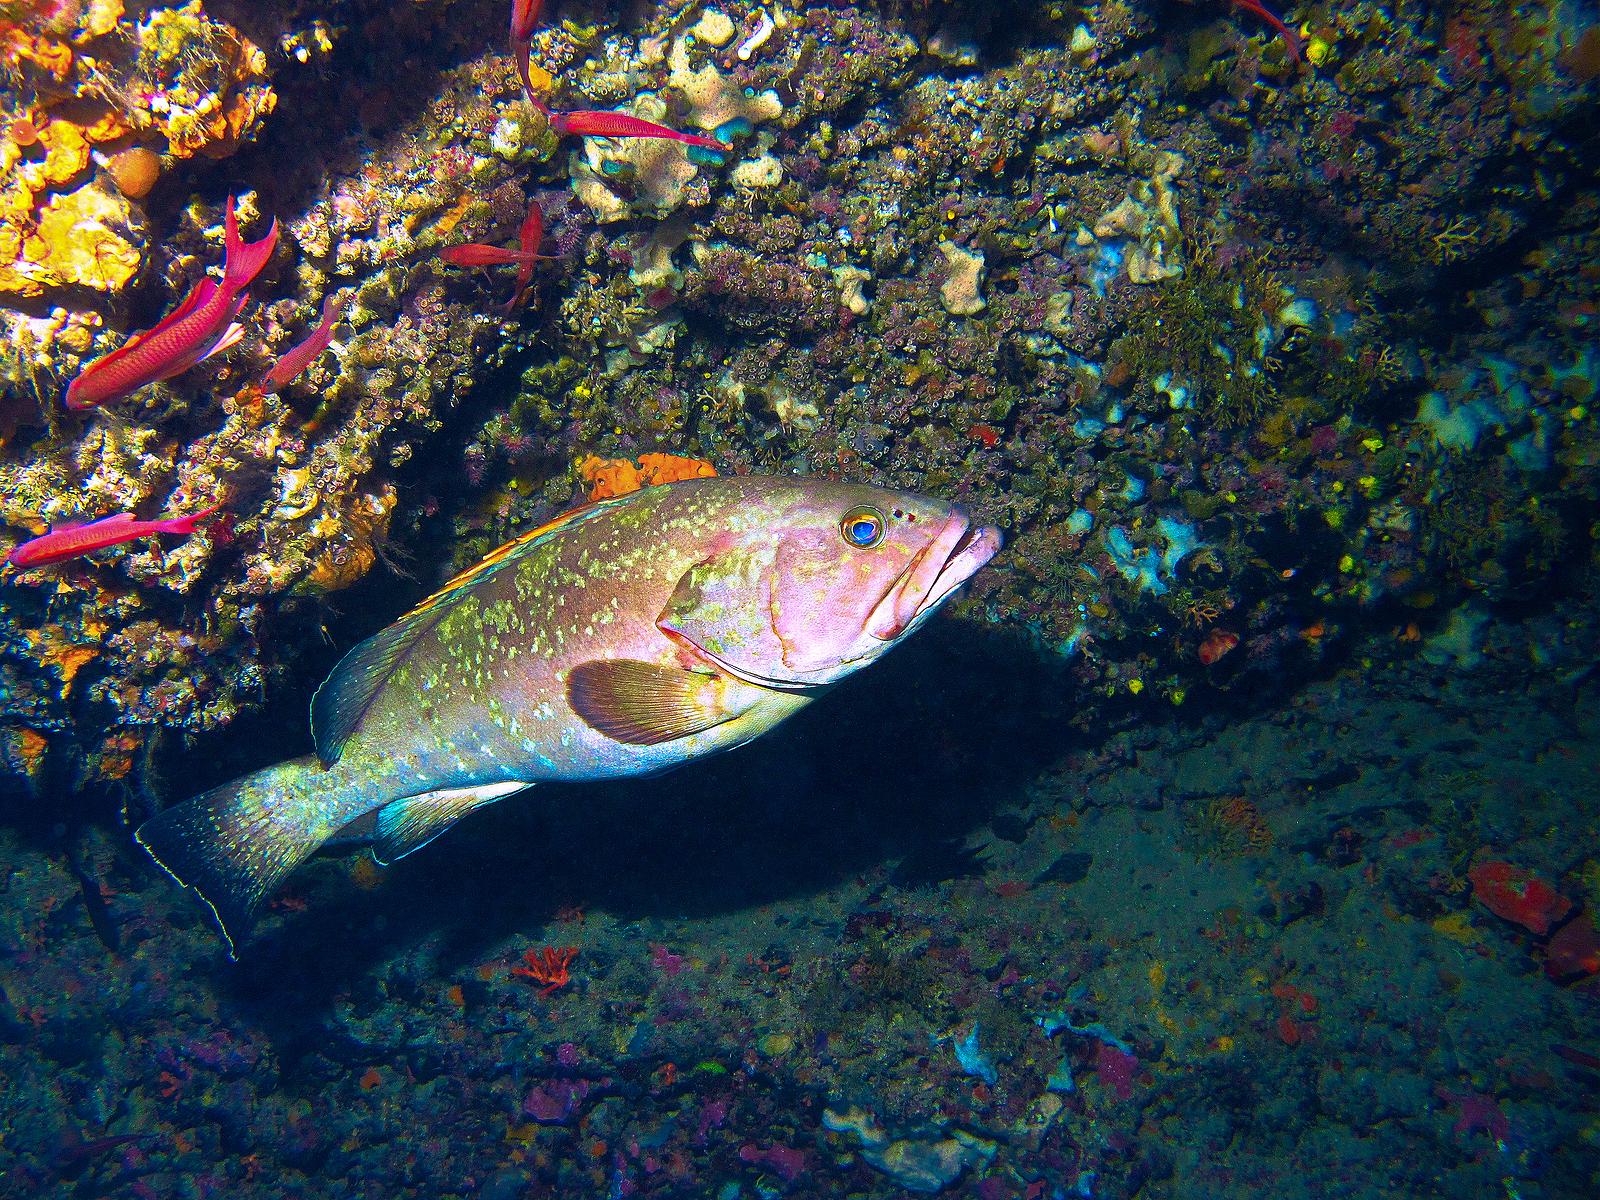 A grouper found on a scuba dive in Spain